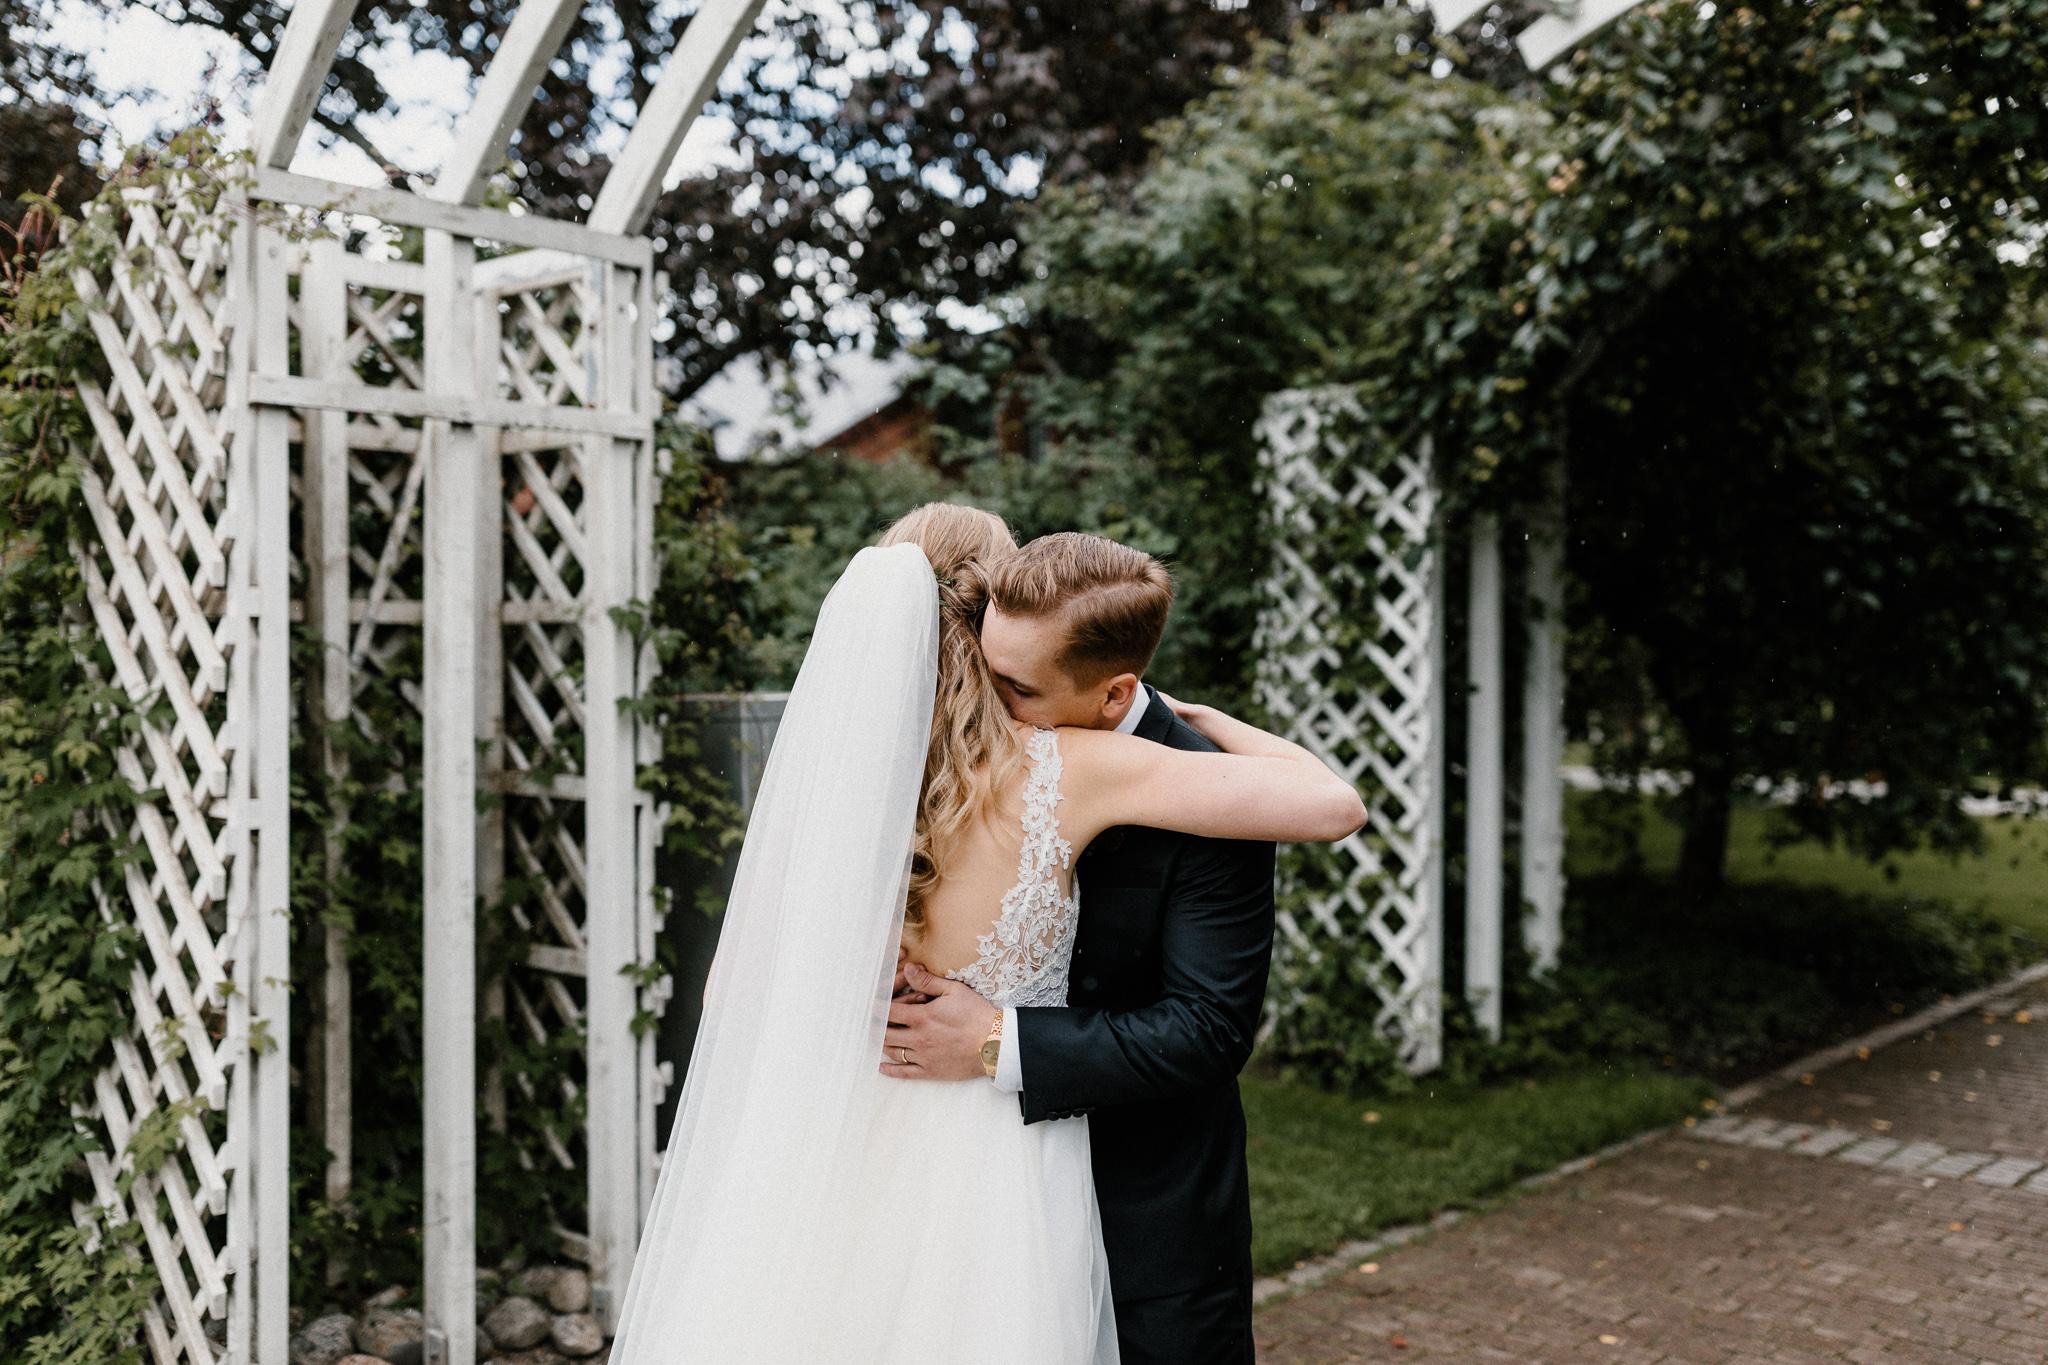 Johanna + Mikko - Tampere - Photo by Patrick Karkkolainen Wedding Photographer-20.jpg